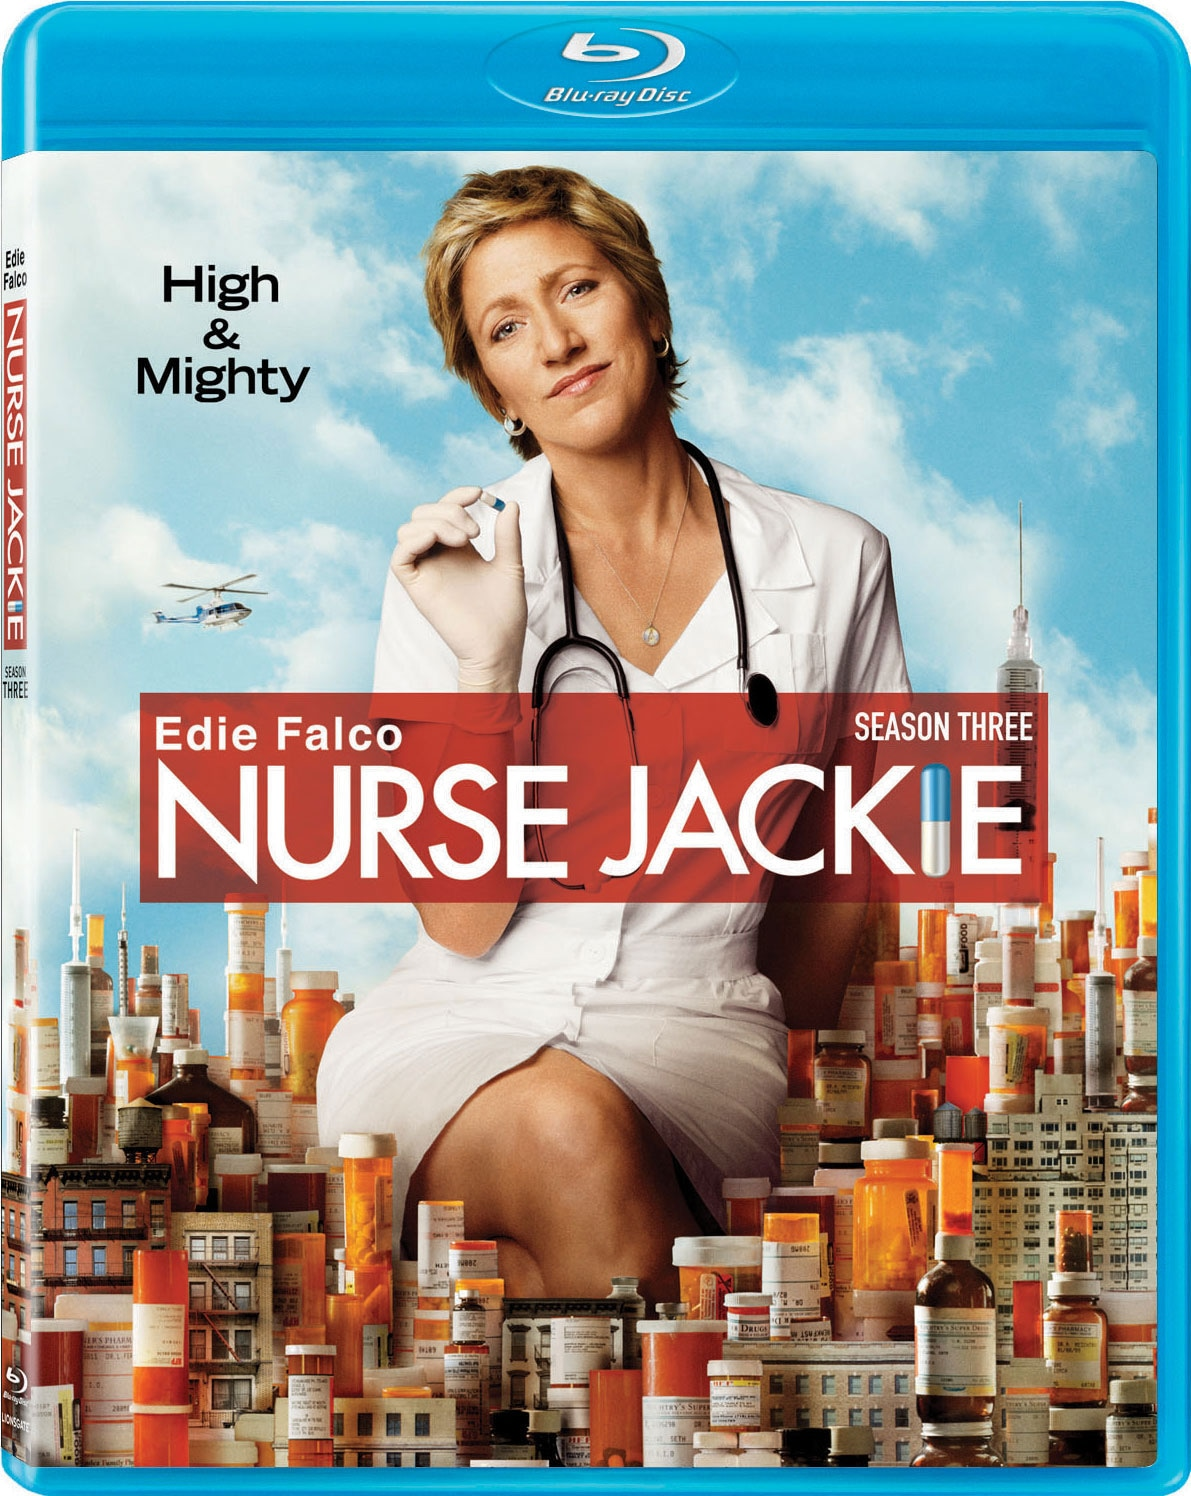 Nurse Jackie: Season 3 (Blu-ray Disc)